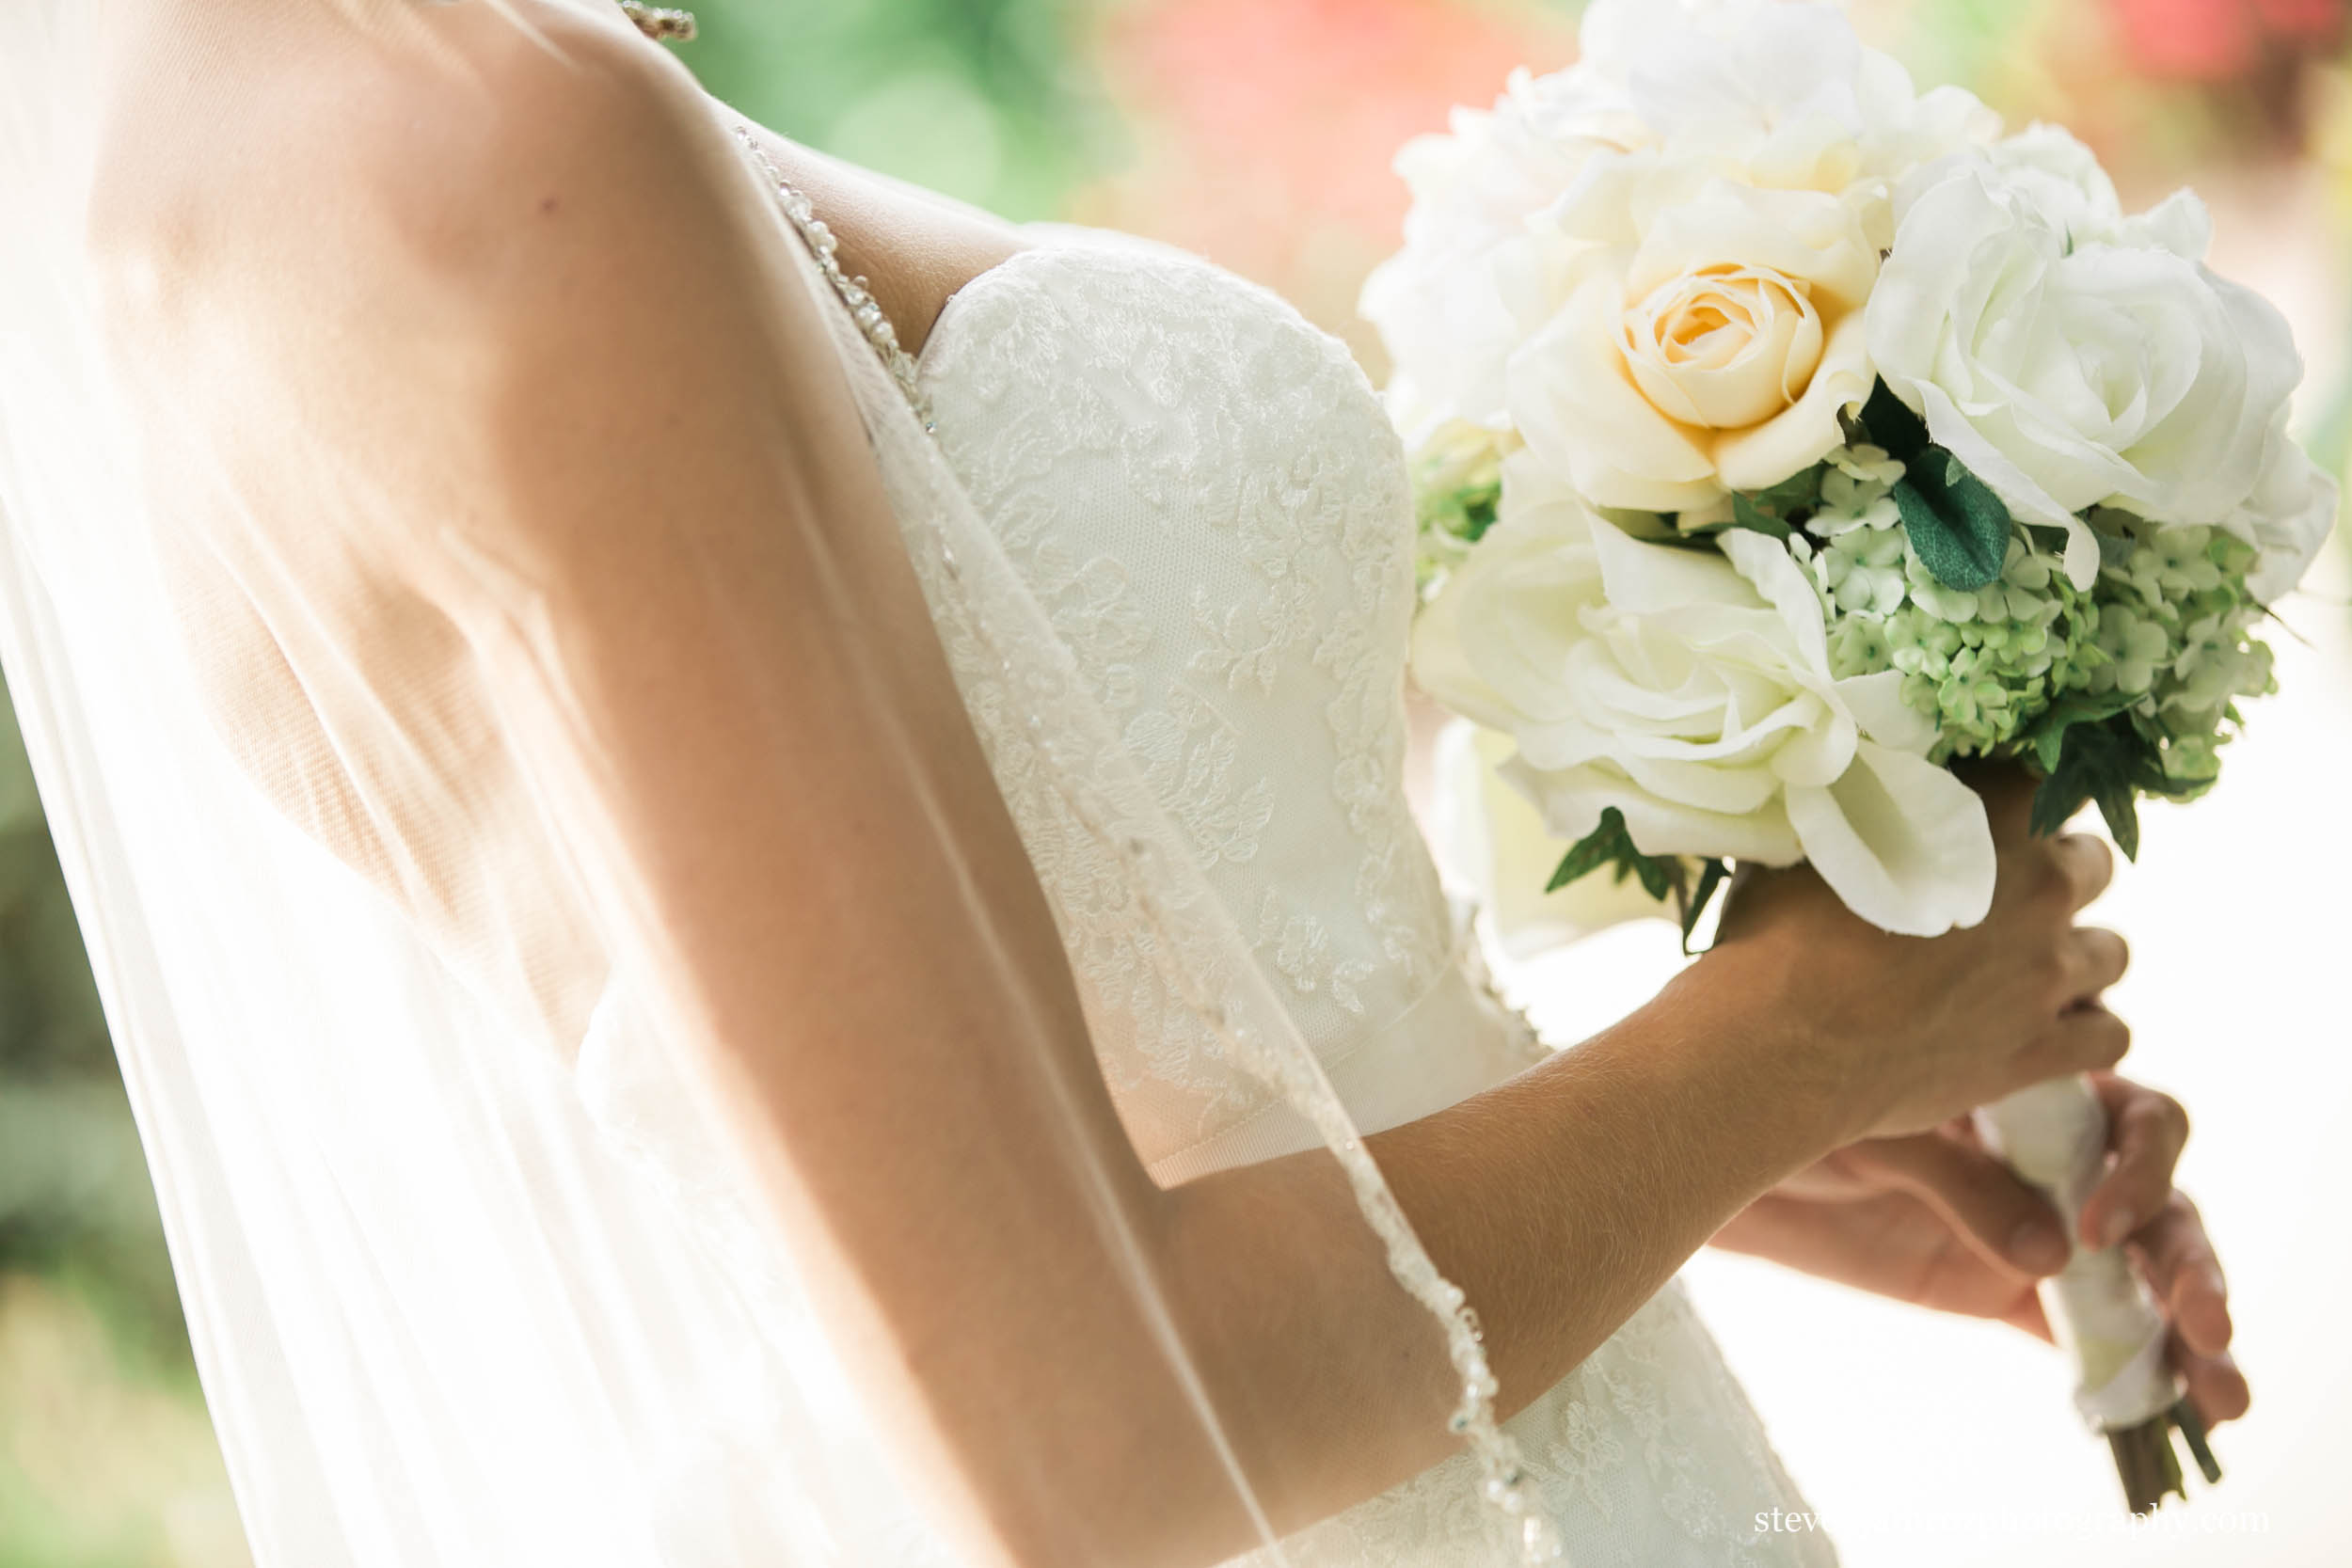 pretty-bouquet-flowers-wedding-steven-jamroz-photography-0211.jpg